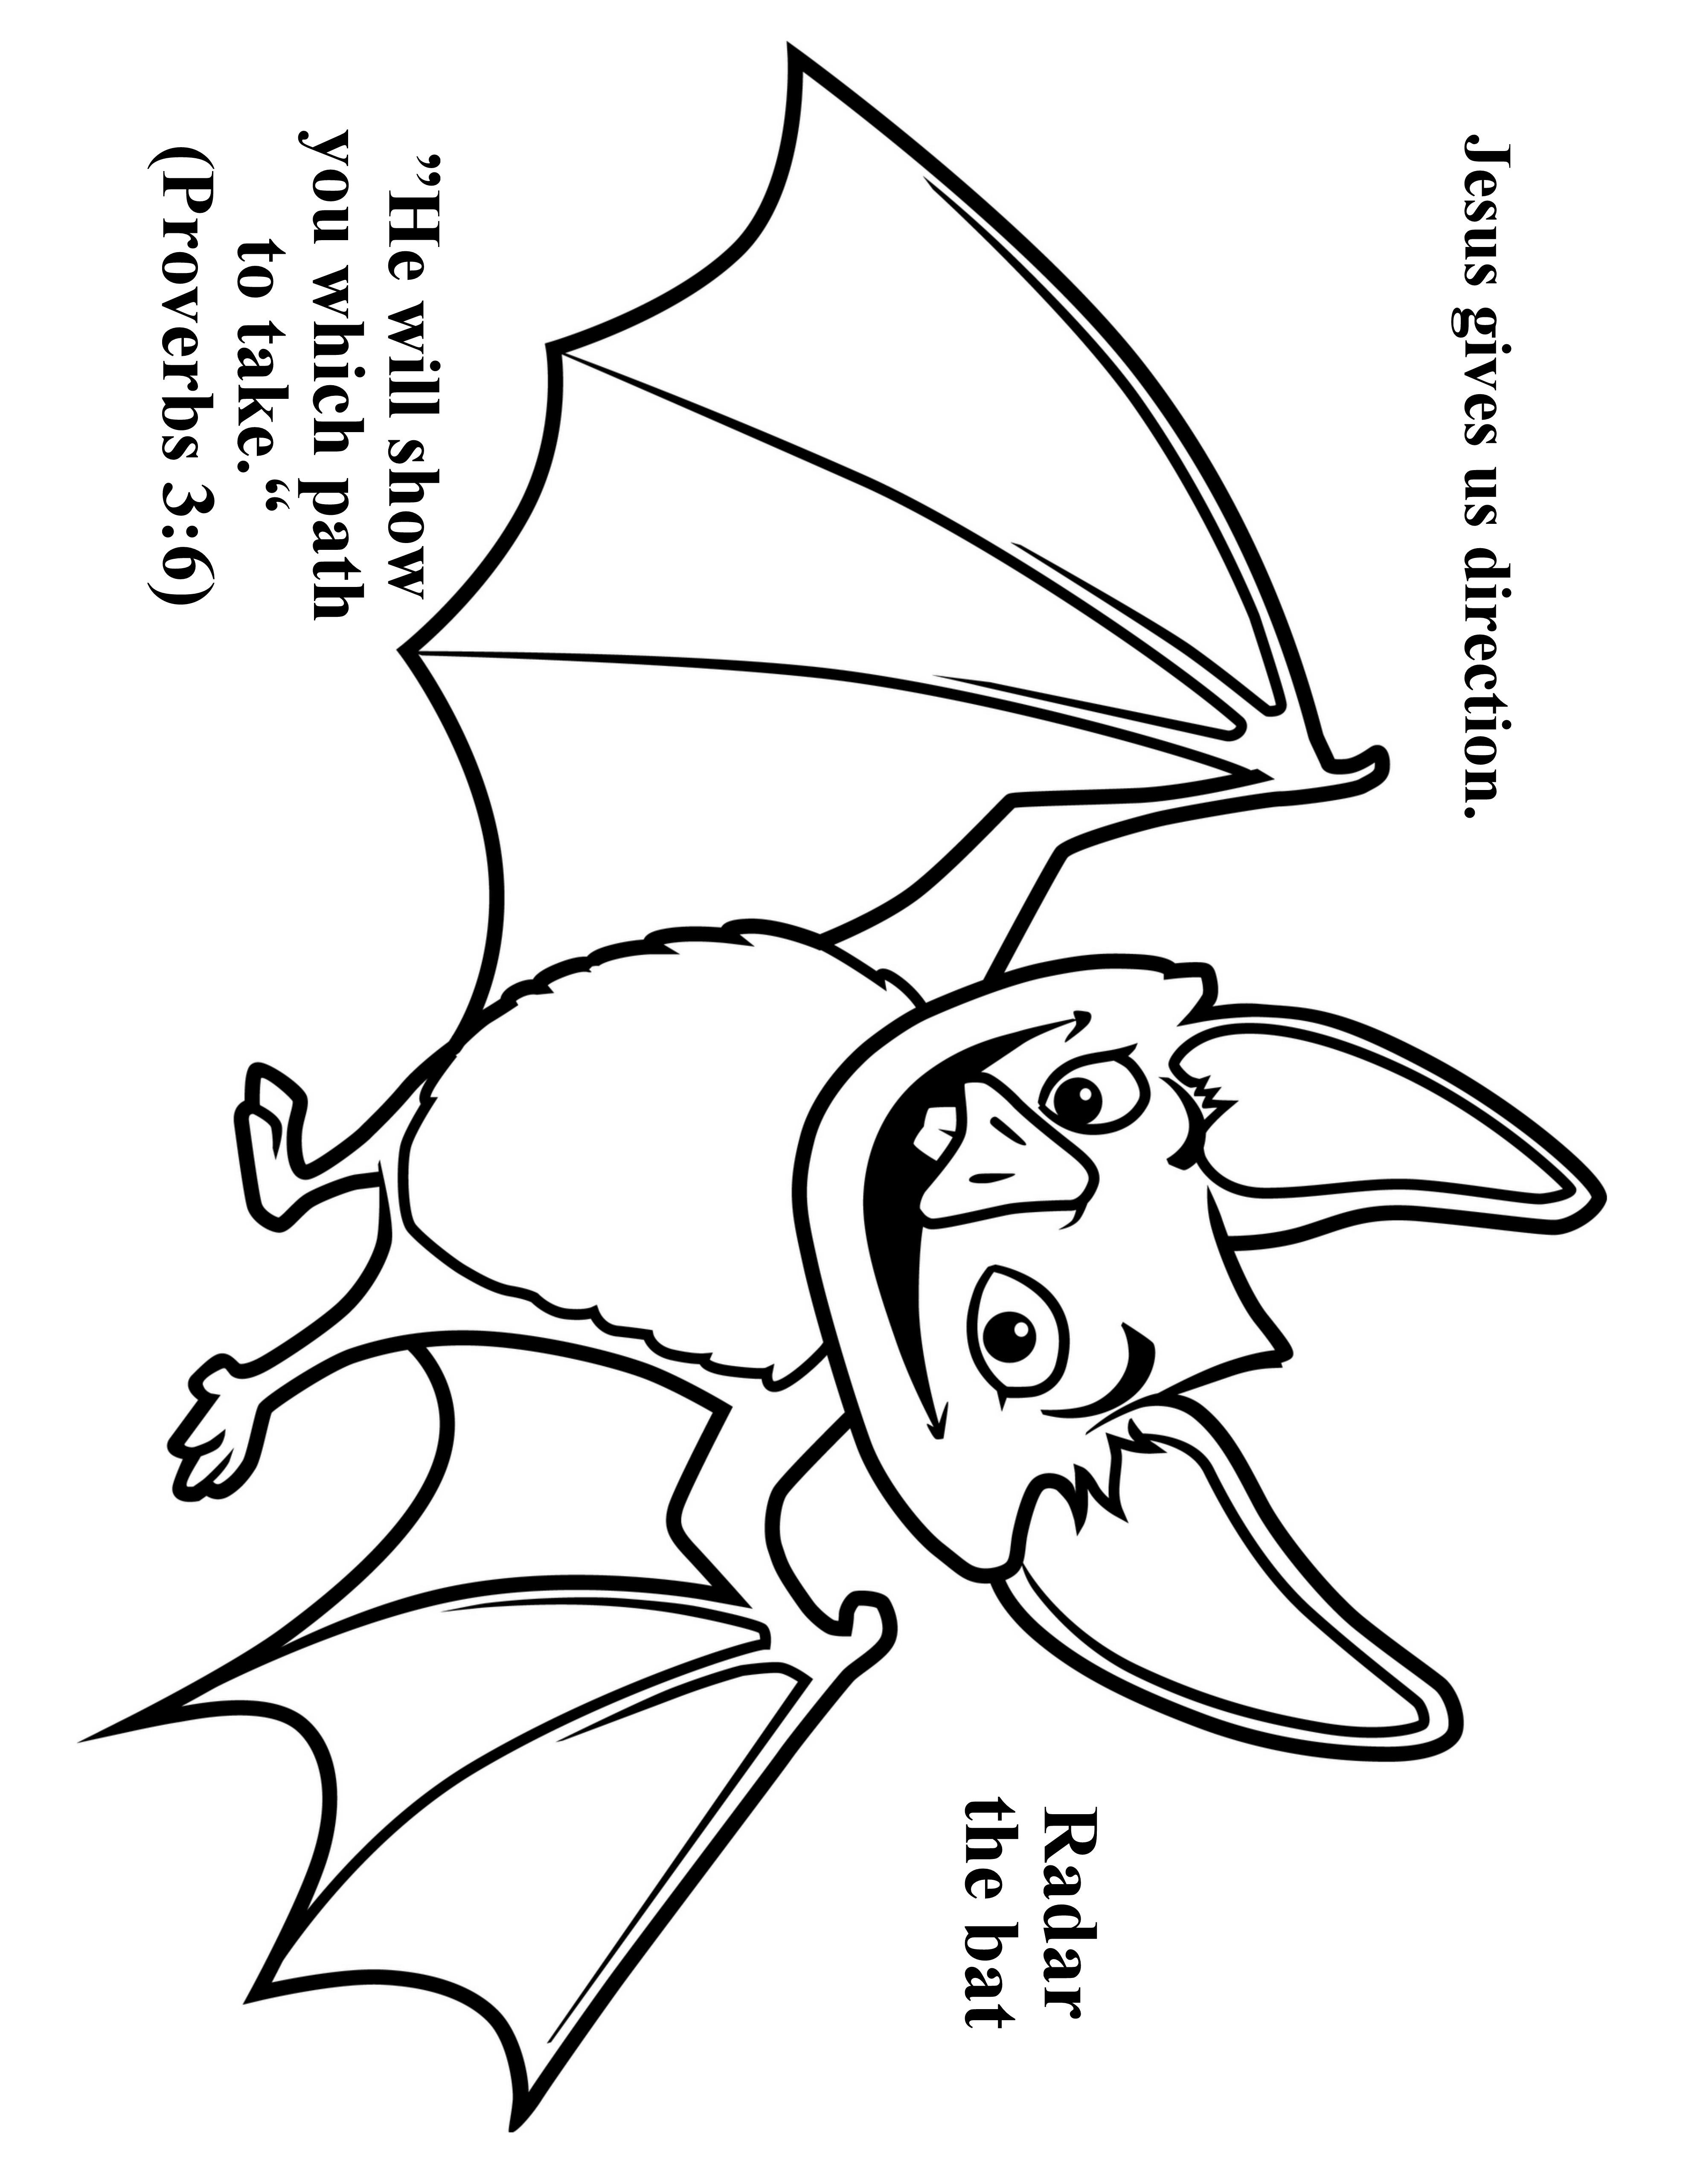 3952x5120 Bat Coloring Pages Preschool Best Of Cave Quest Day Preschool